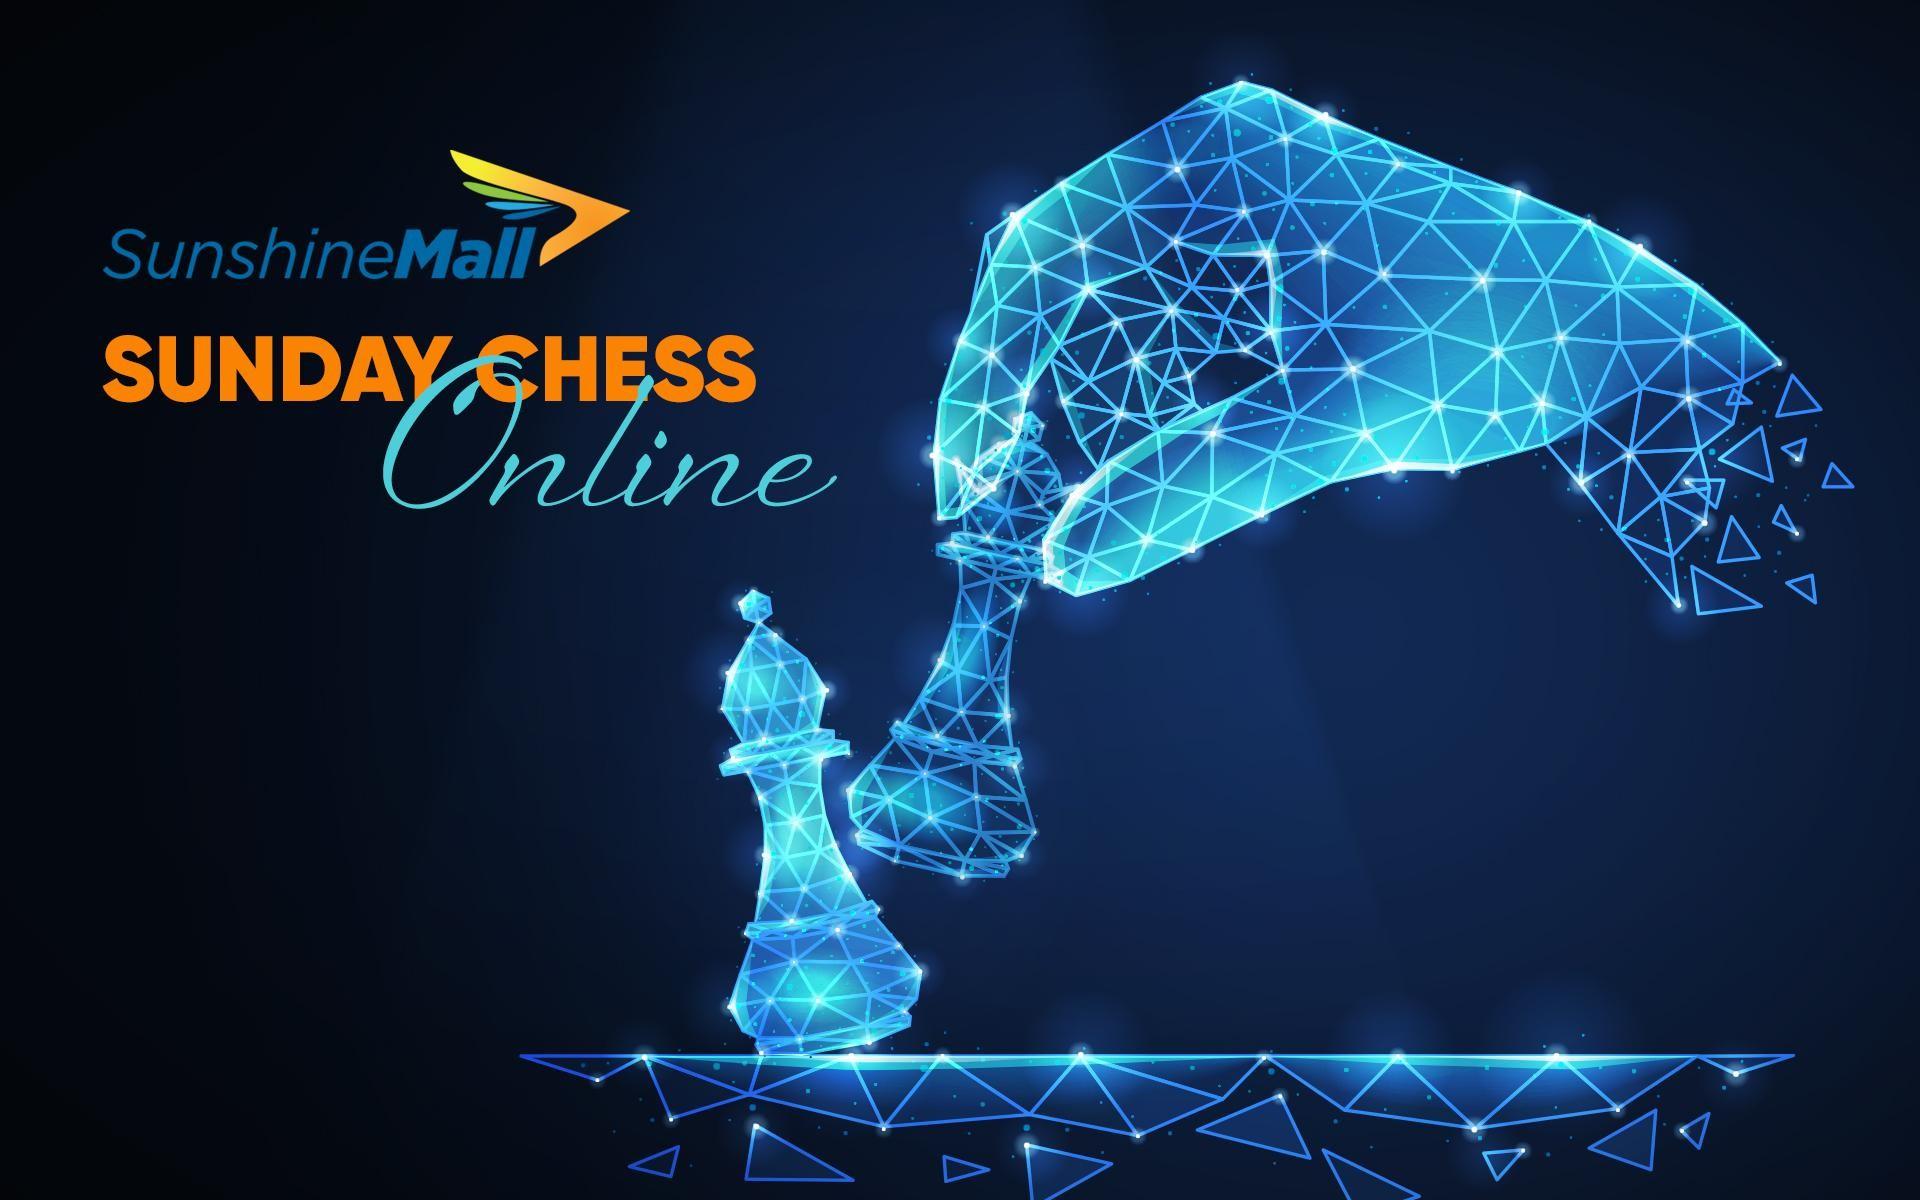 giai-co-vua-sunday-chess-online4-1633598675.jpg